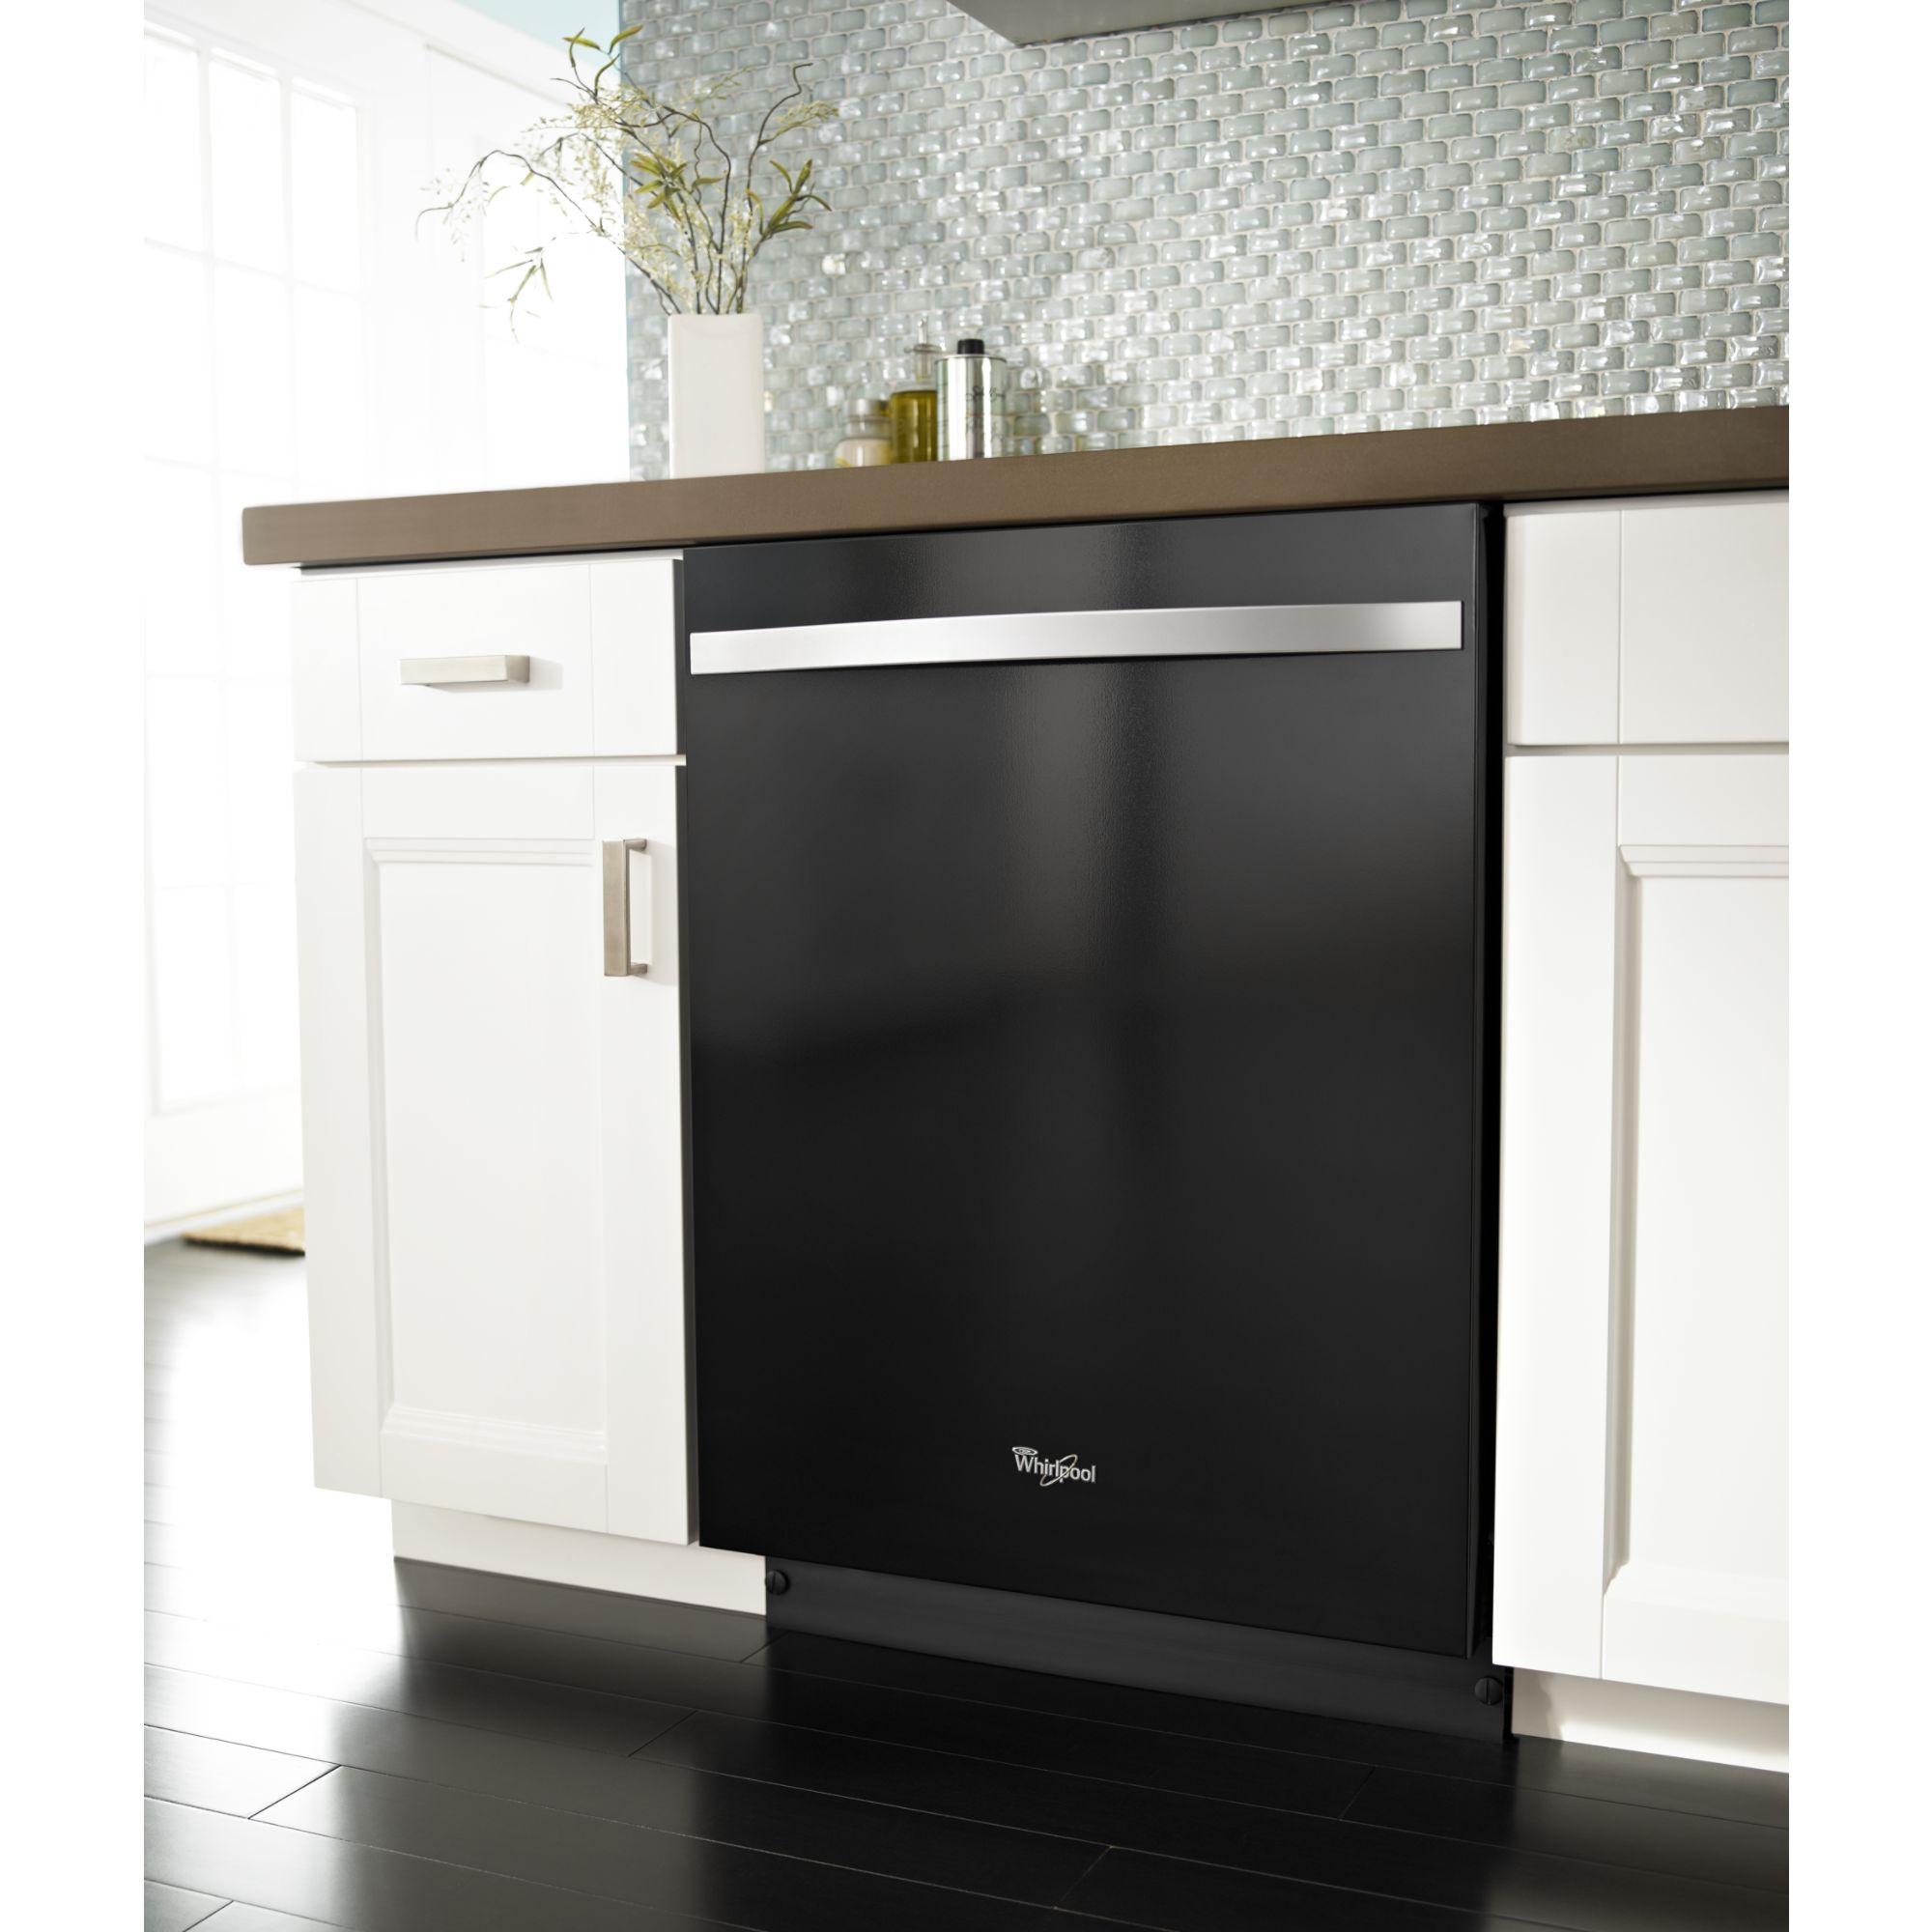 "Whirlpool 24"" Built-In Dishwasher w/ PowerScour™ Option - Black Ice"